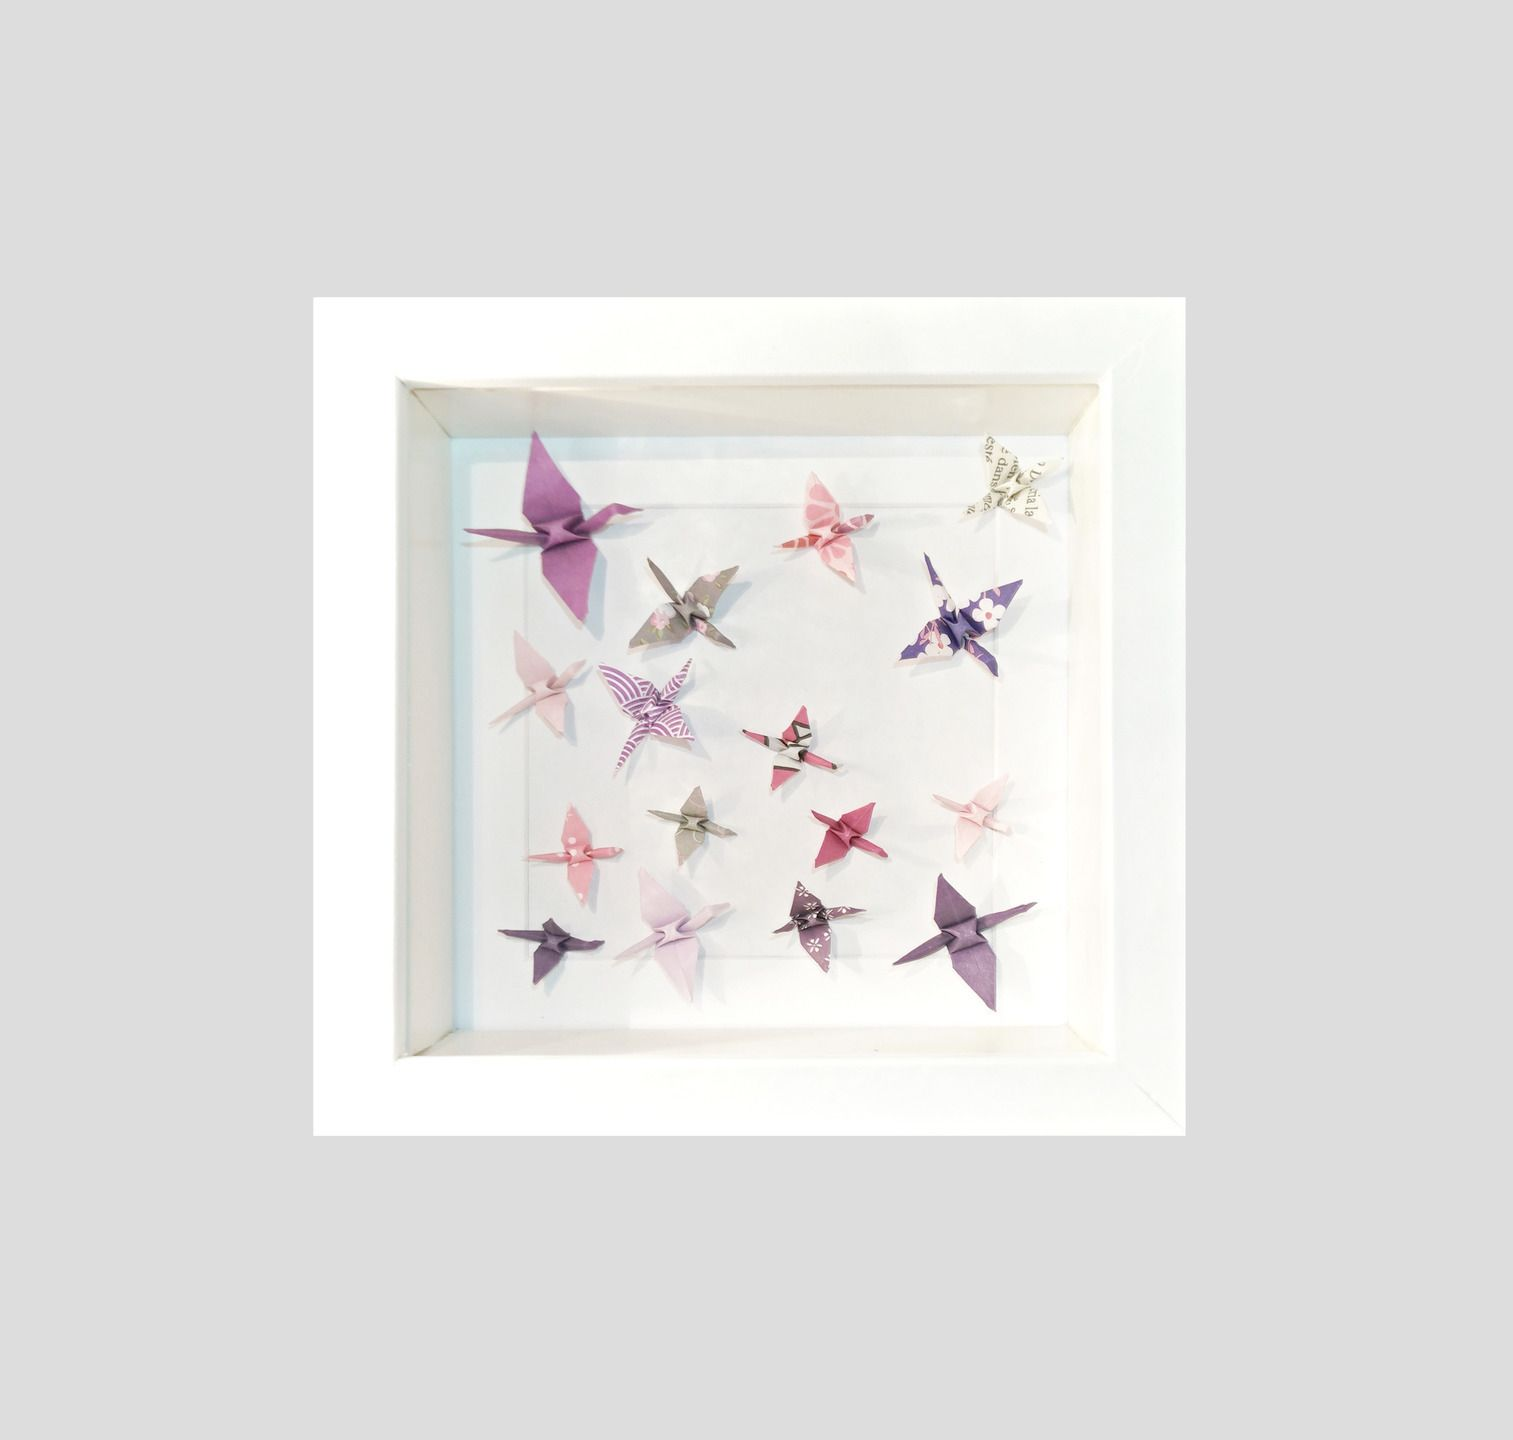 cadre bois blanc origami papier grues fait main id e cadeau naissance origami d corations. Black Bedroom Furniture Sets. Home Design Ideas